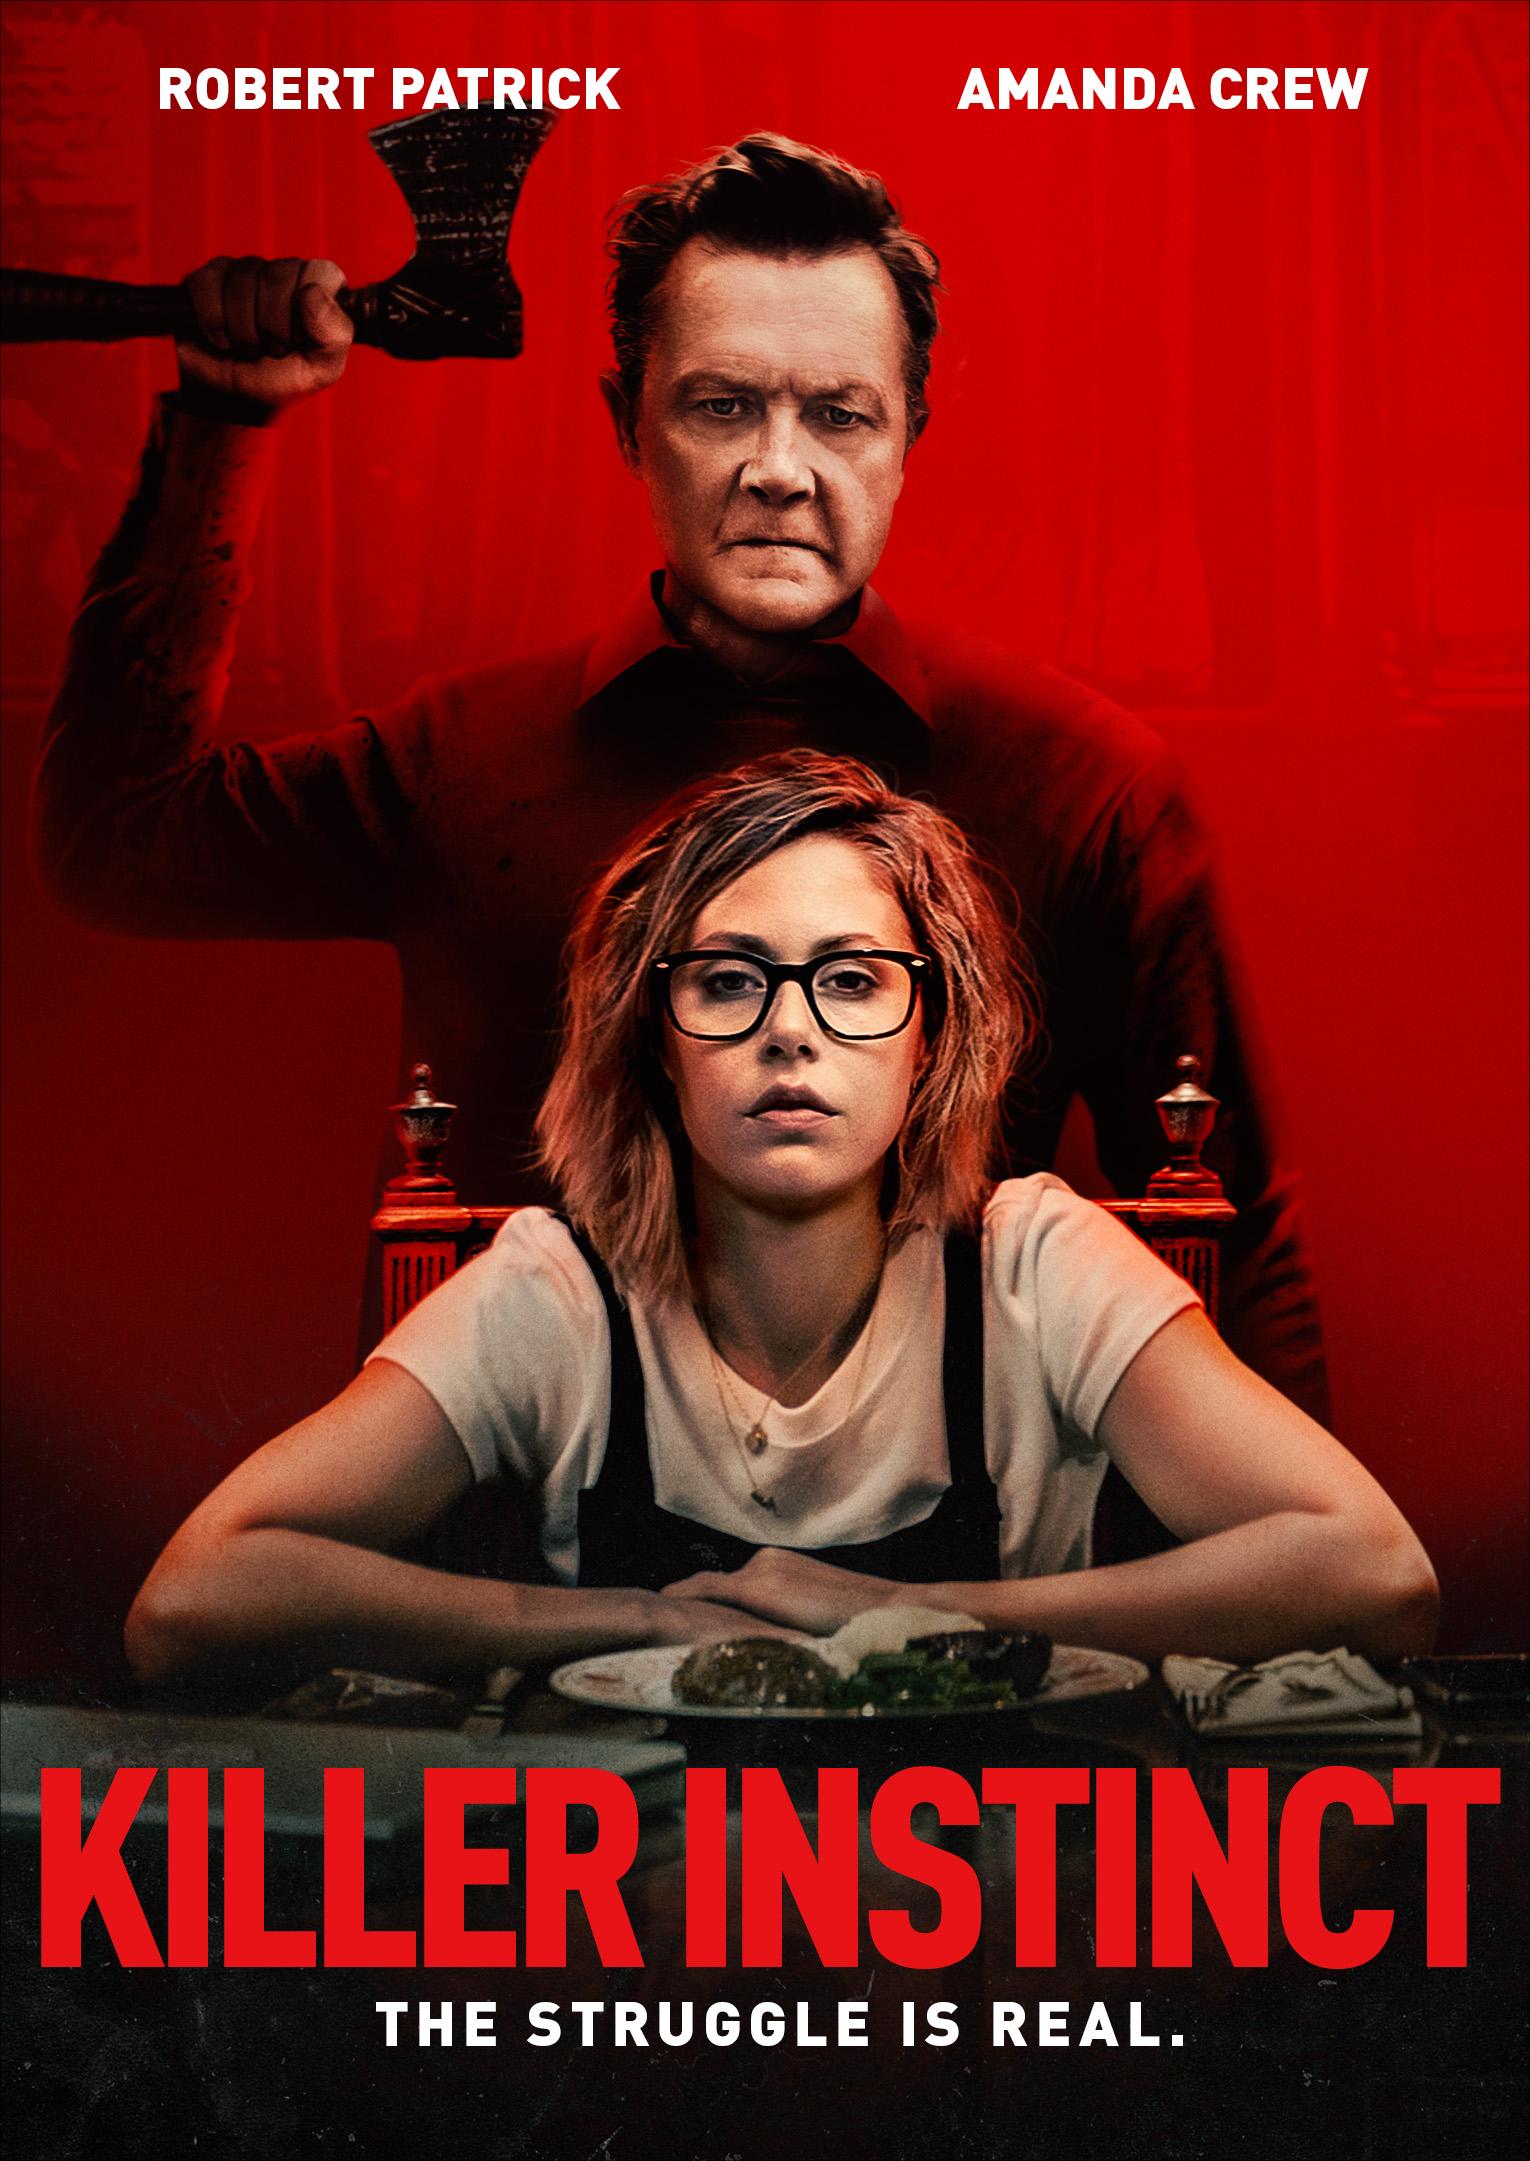 Killer Instinct review: The generation game